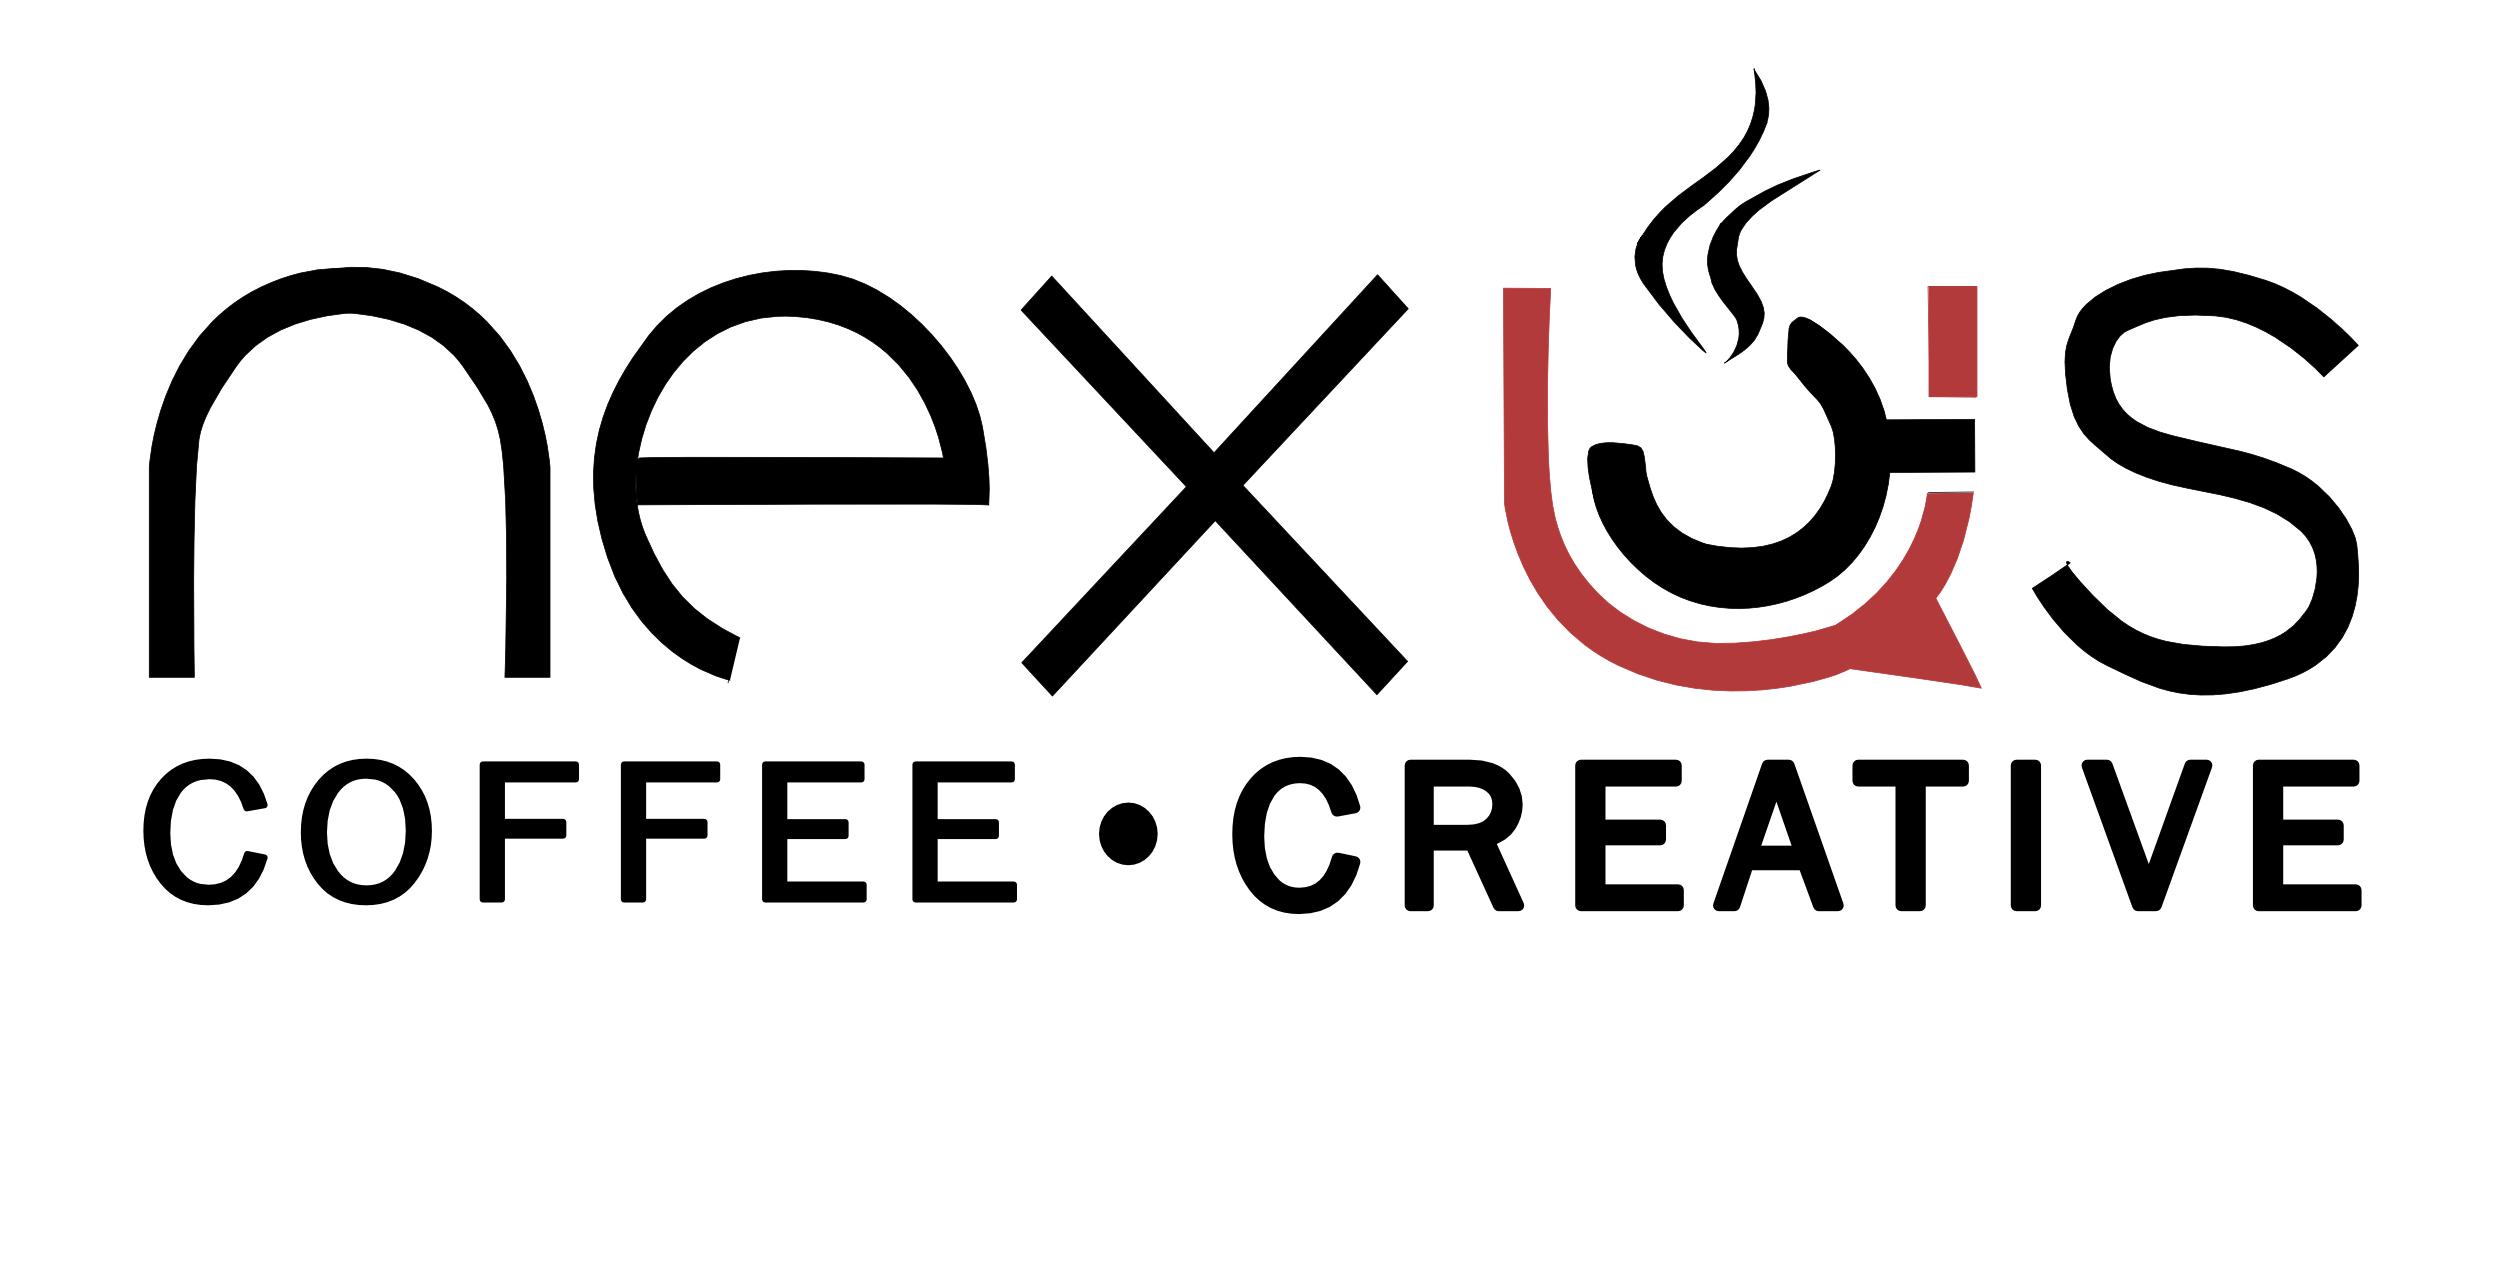 lrac-web-logos.png